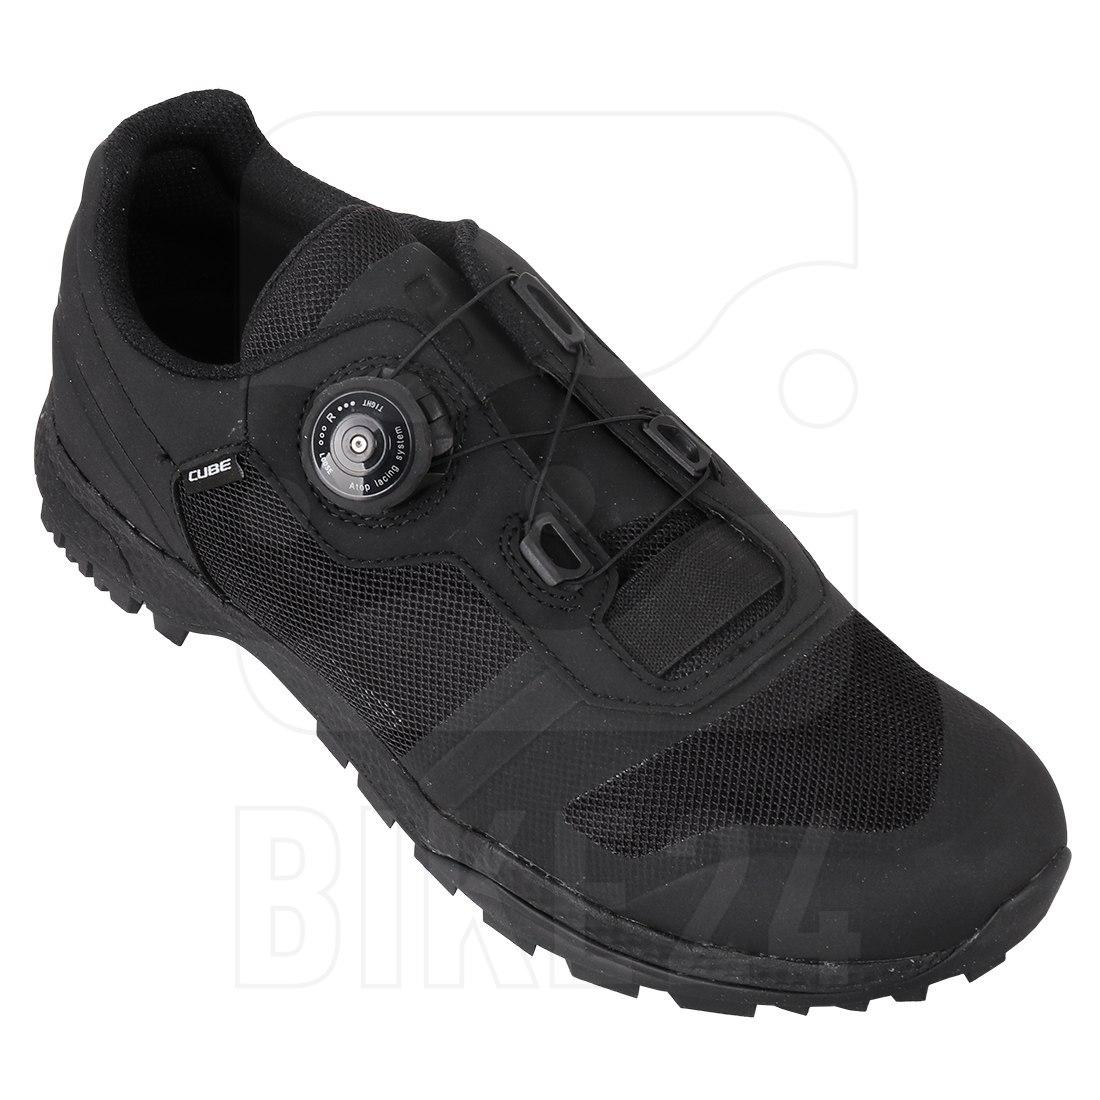 CUBE Shoe ATX LYNX PRO - blackline